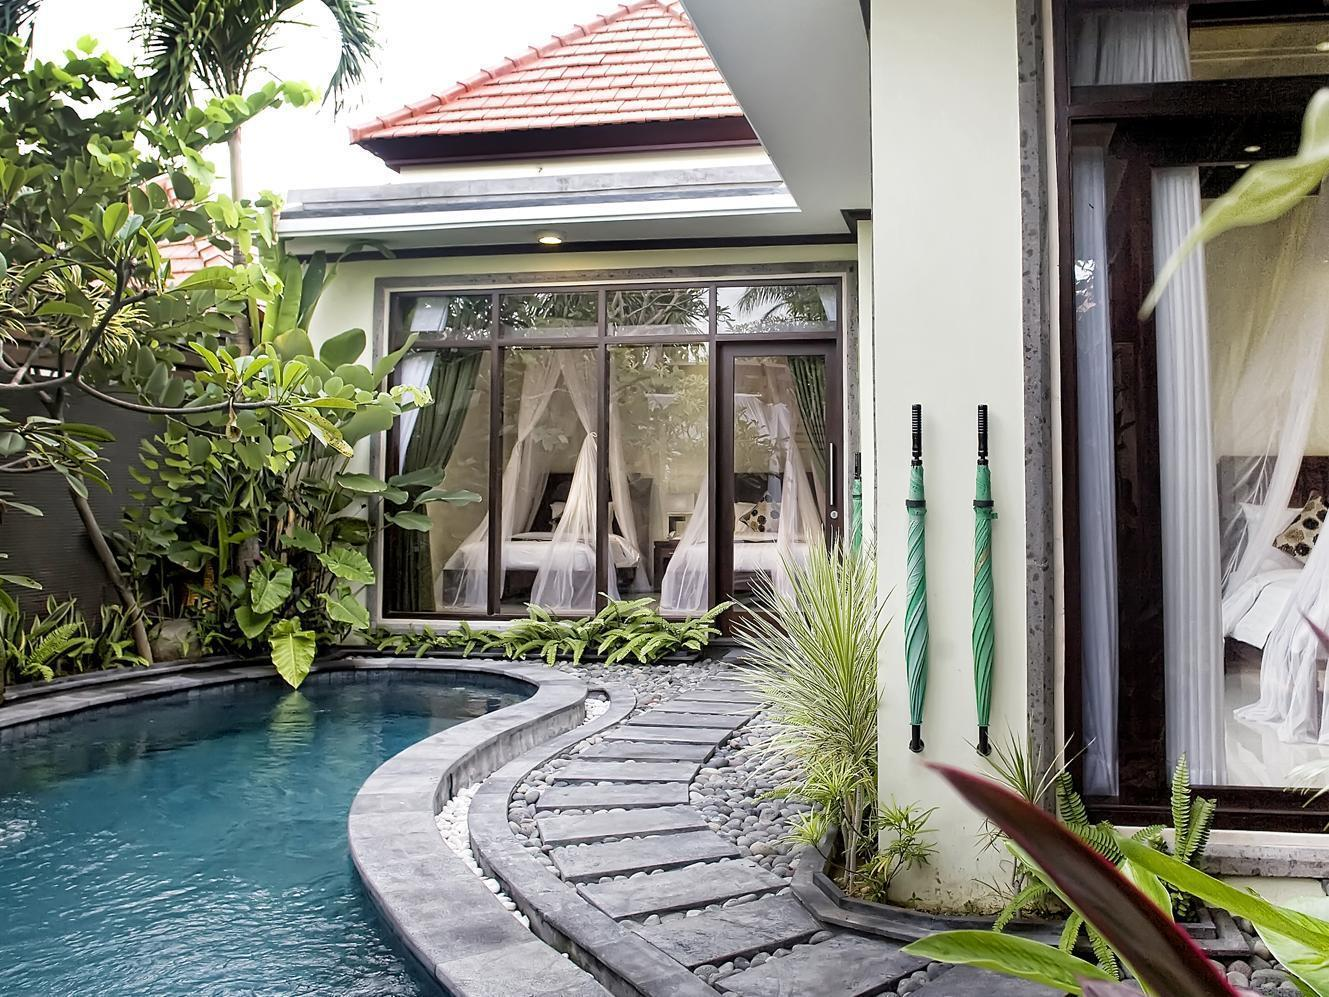 The Bali Dream Villa And Resort Echo Beach Canggu Resort Villa Deals Photos Reviews